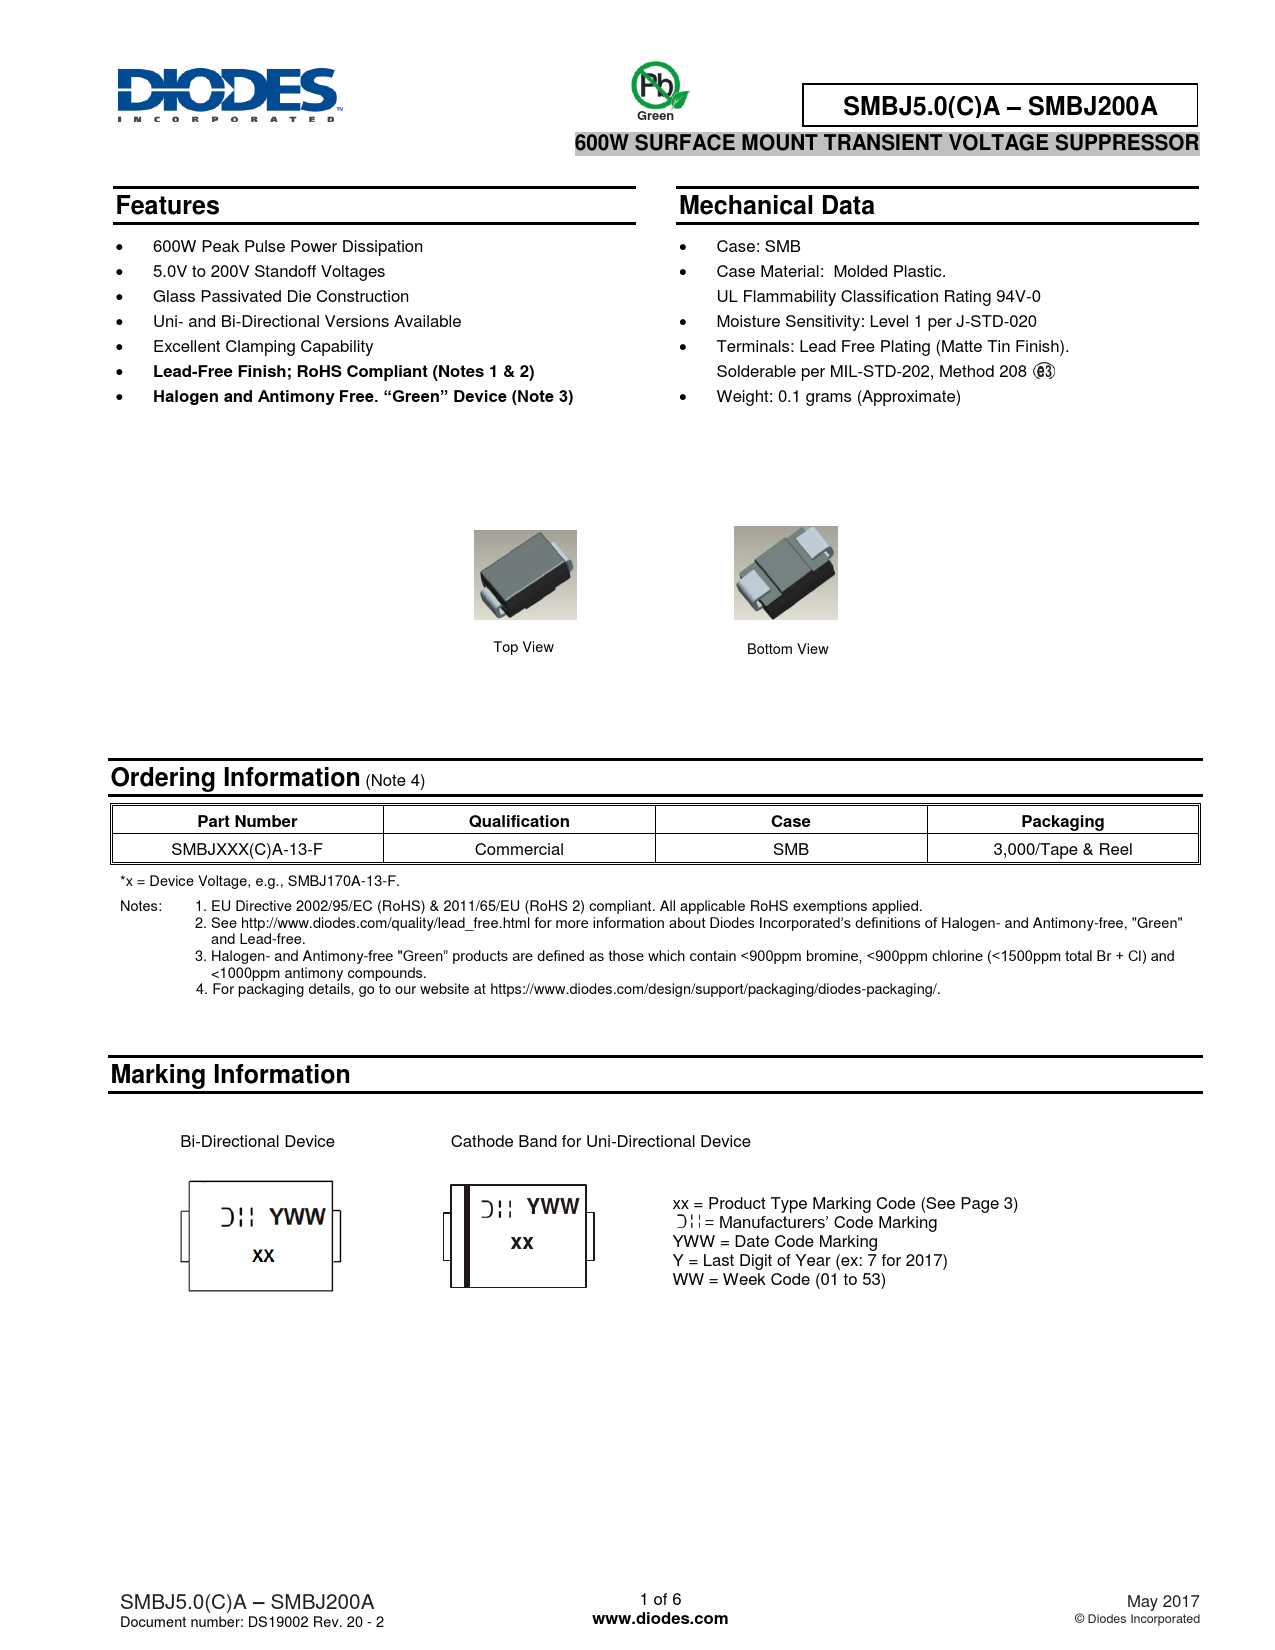 Datasheet SMBJ5.0(C)A – SMBJ200A Diodes